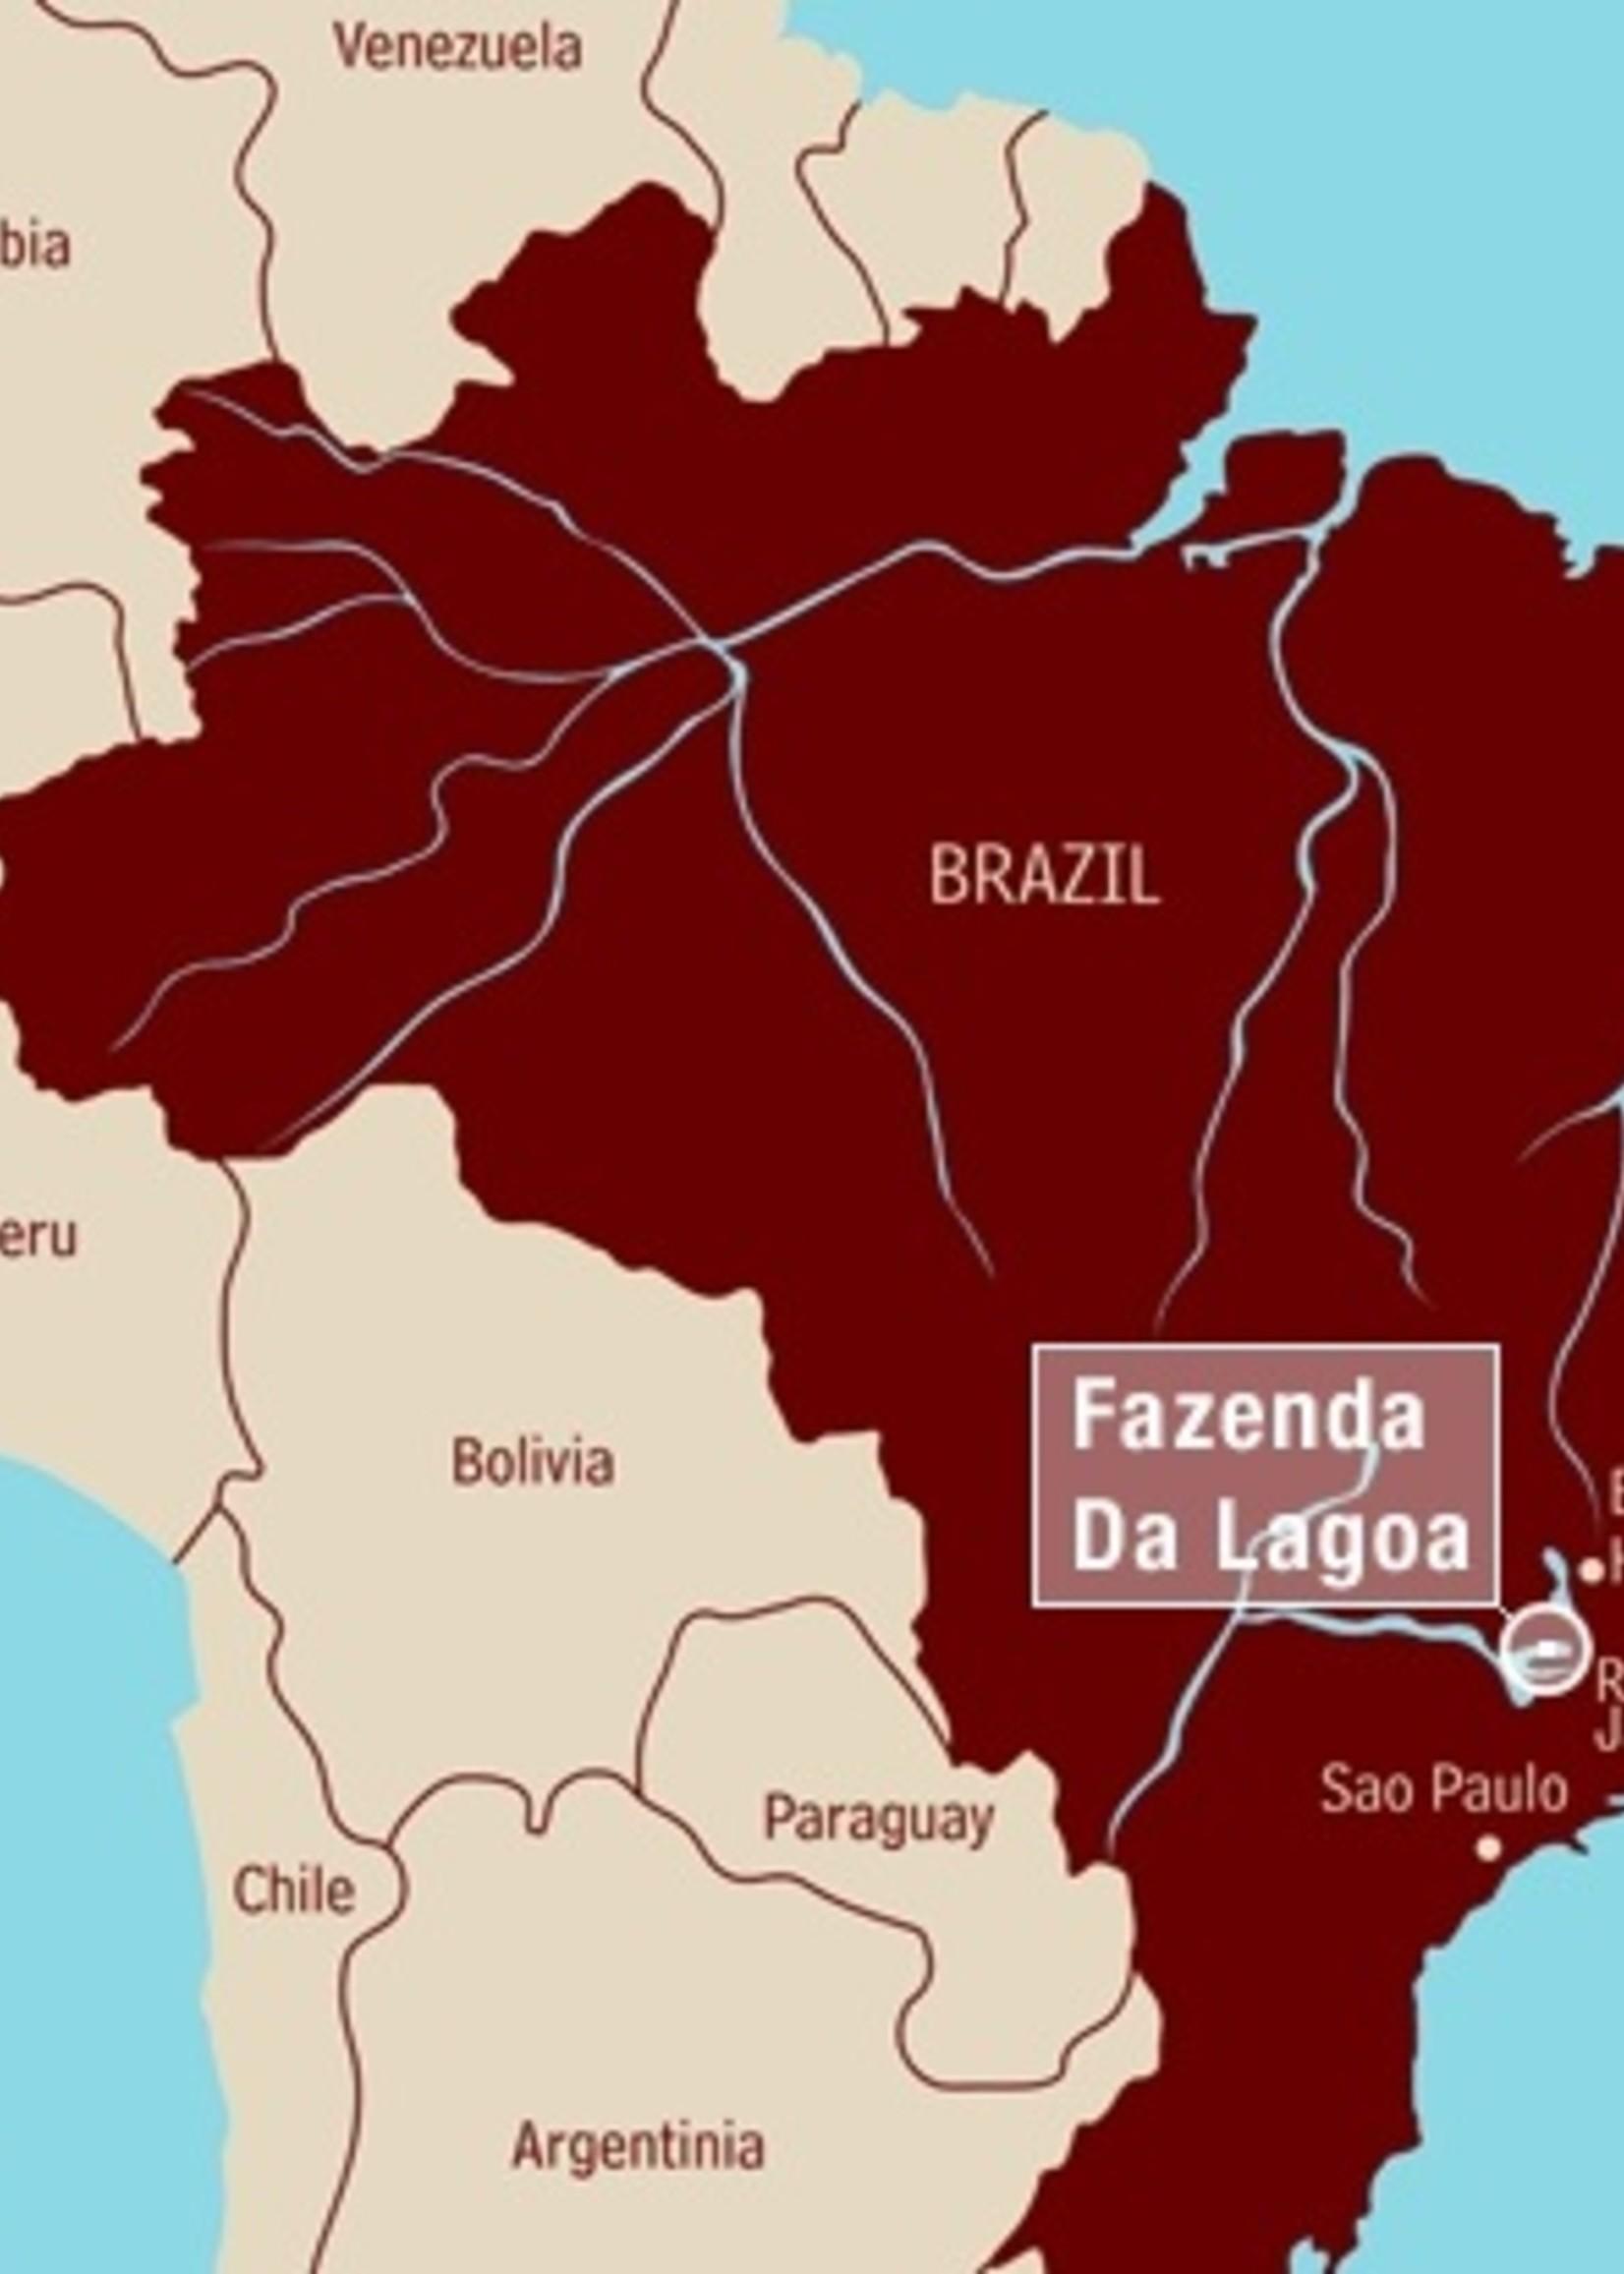 Brazil Fazenda da Lagos Estate